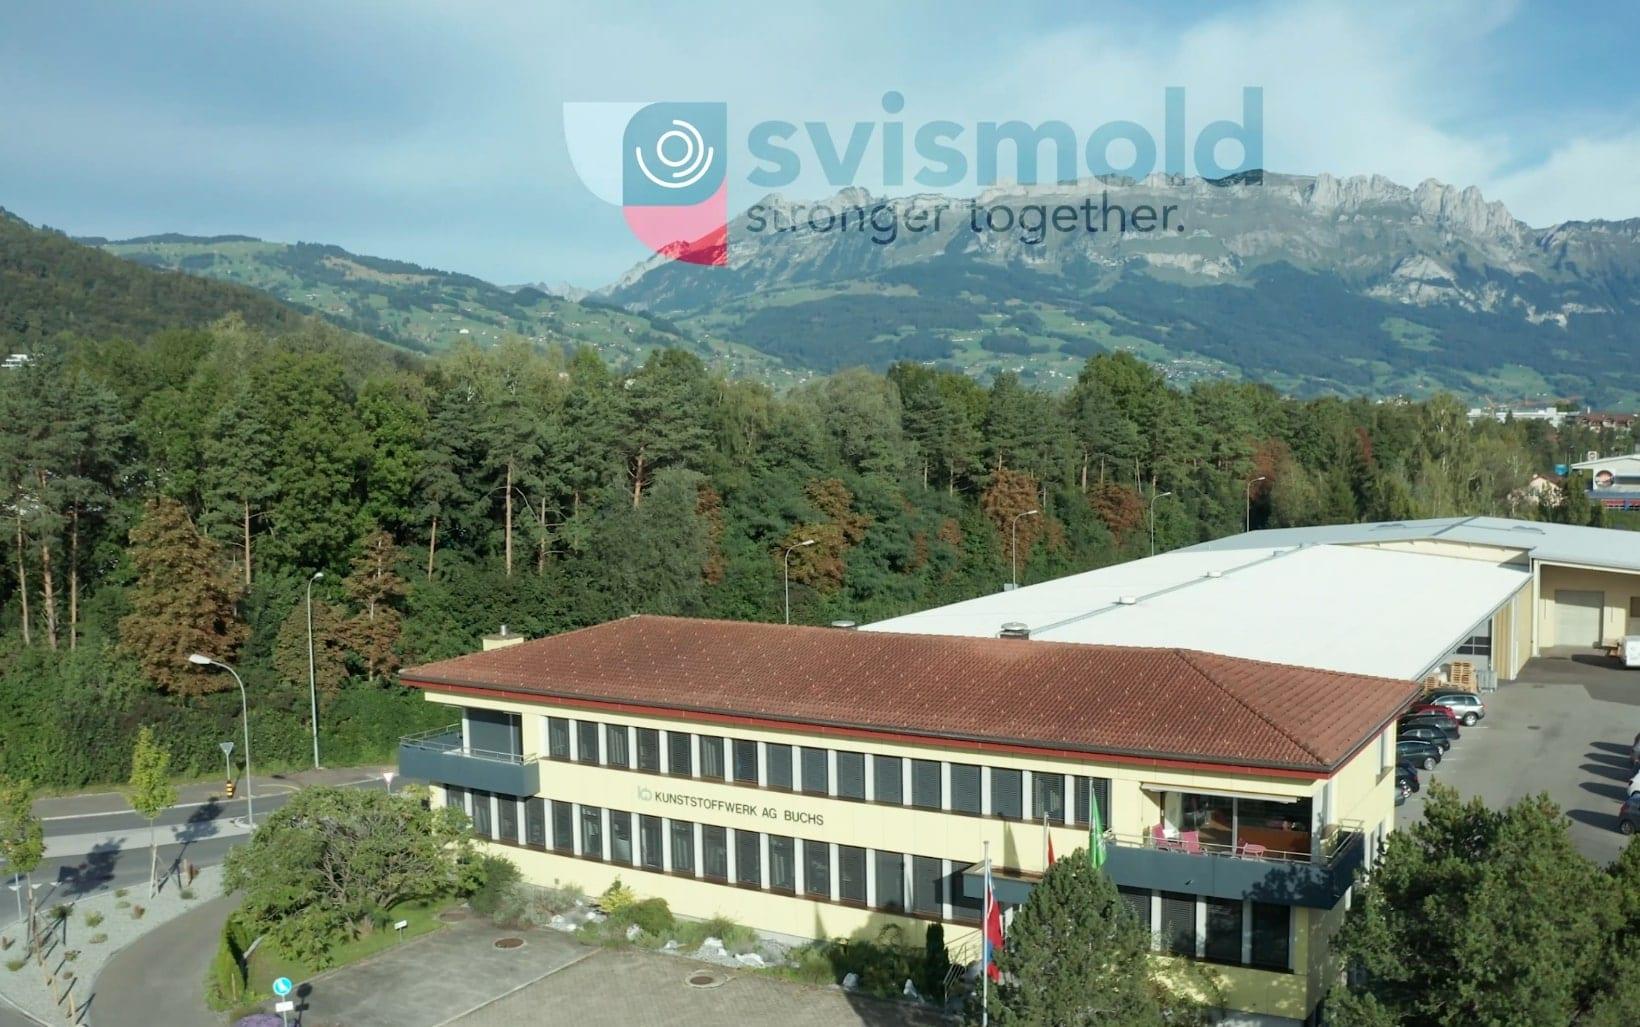 Company svismold - Buchs (SG) Switzerland